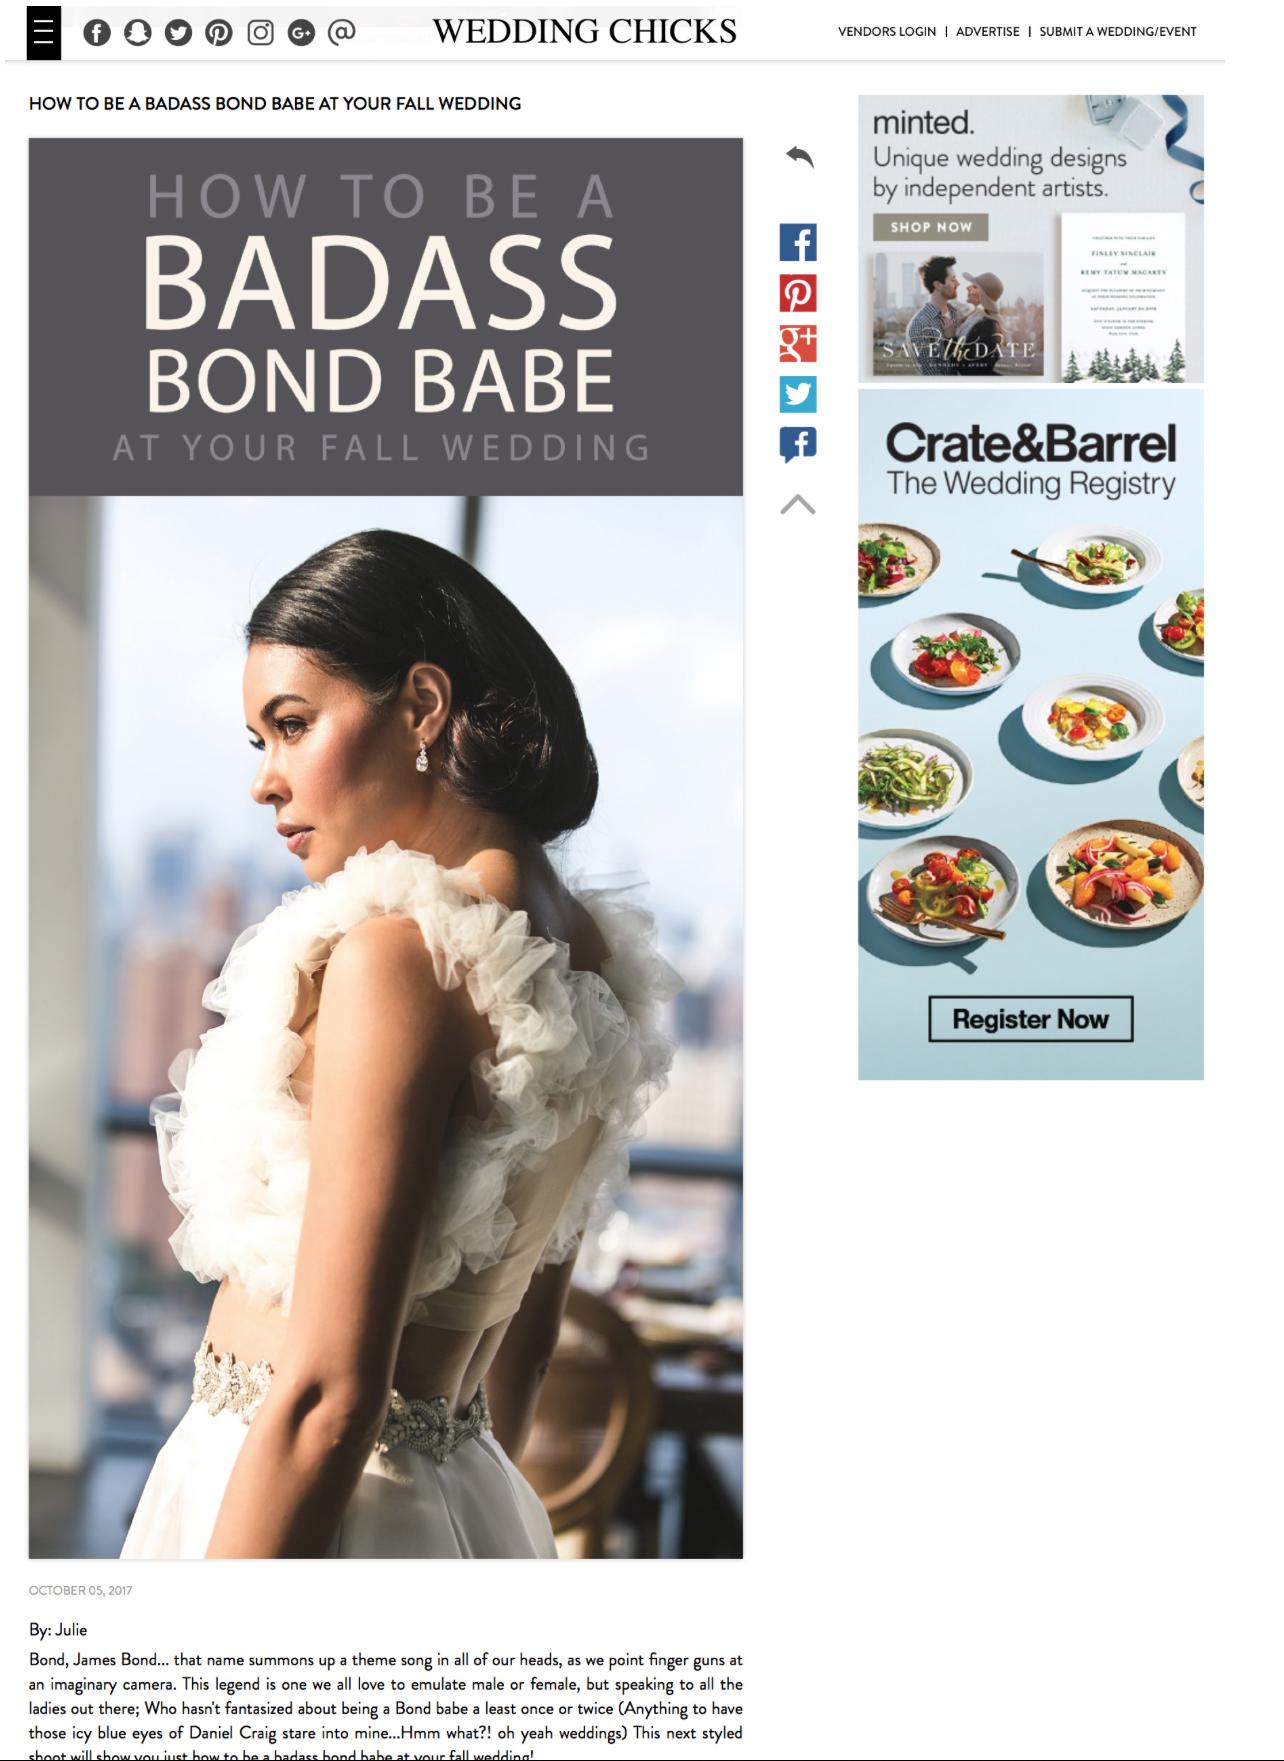 How to be a Badass Bond Babe